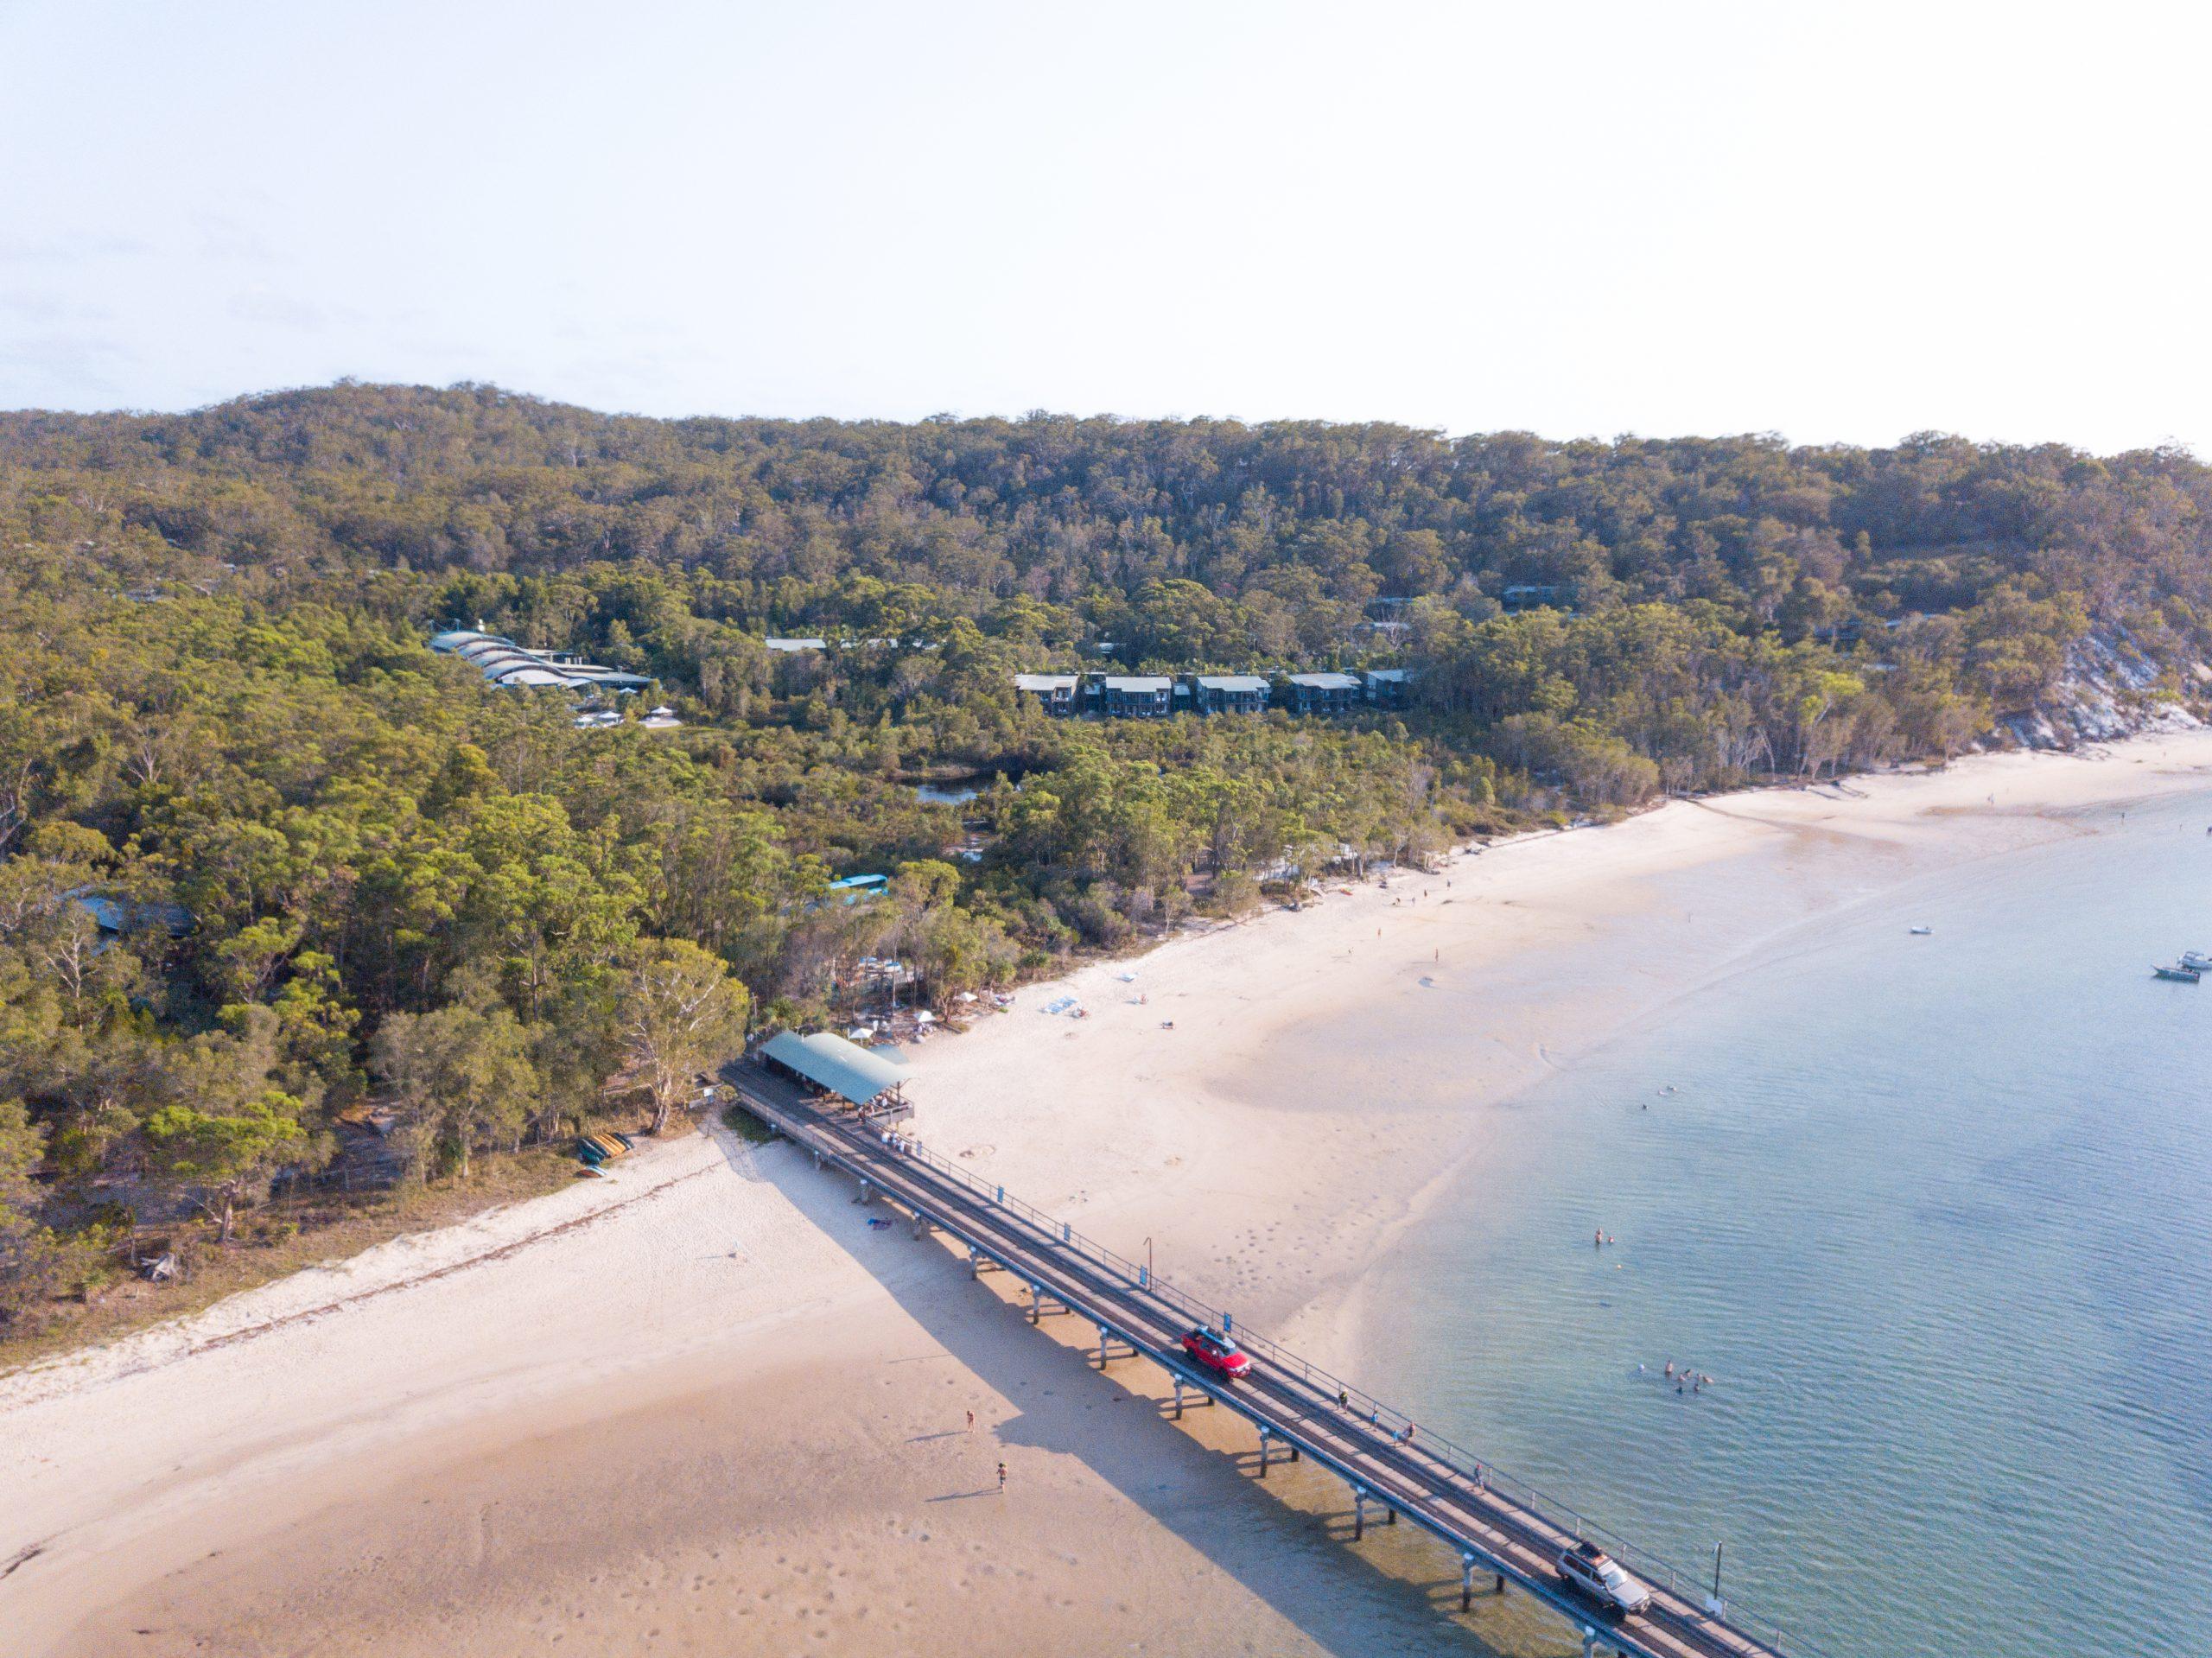 Jetty, Kingfisher Bay, Fraser Island